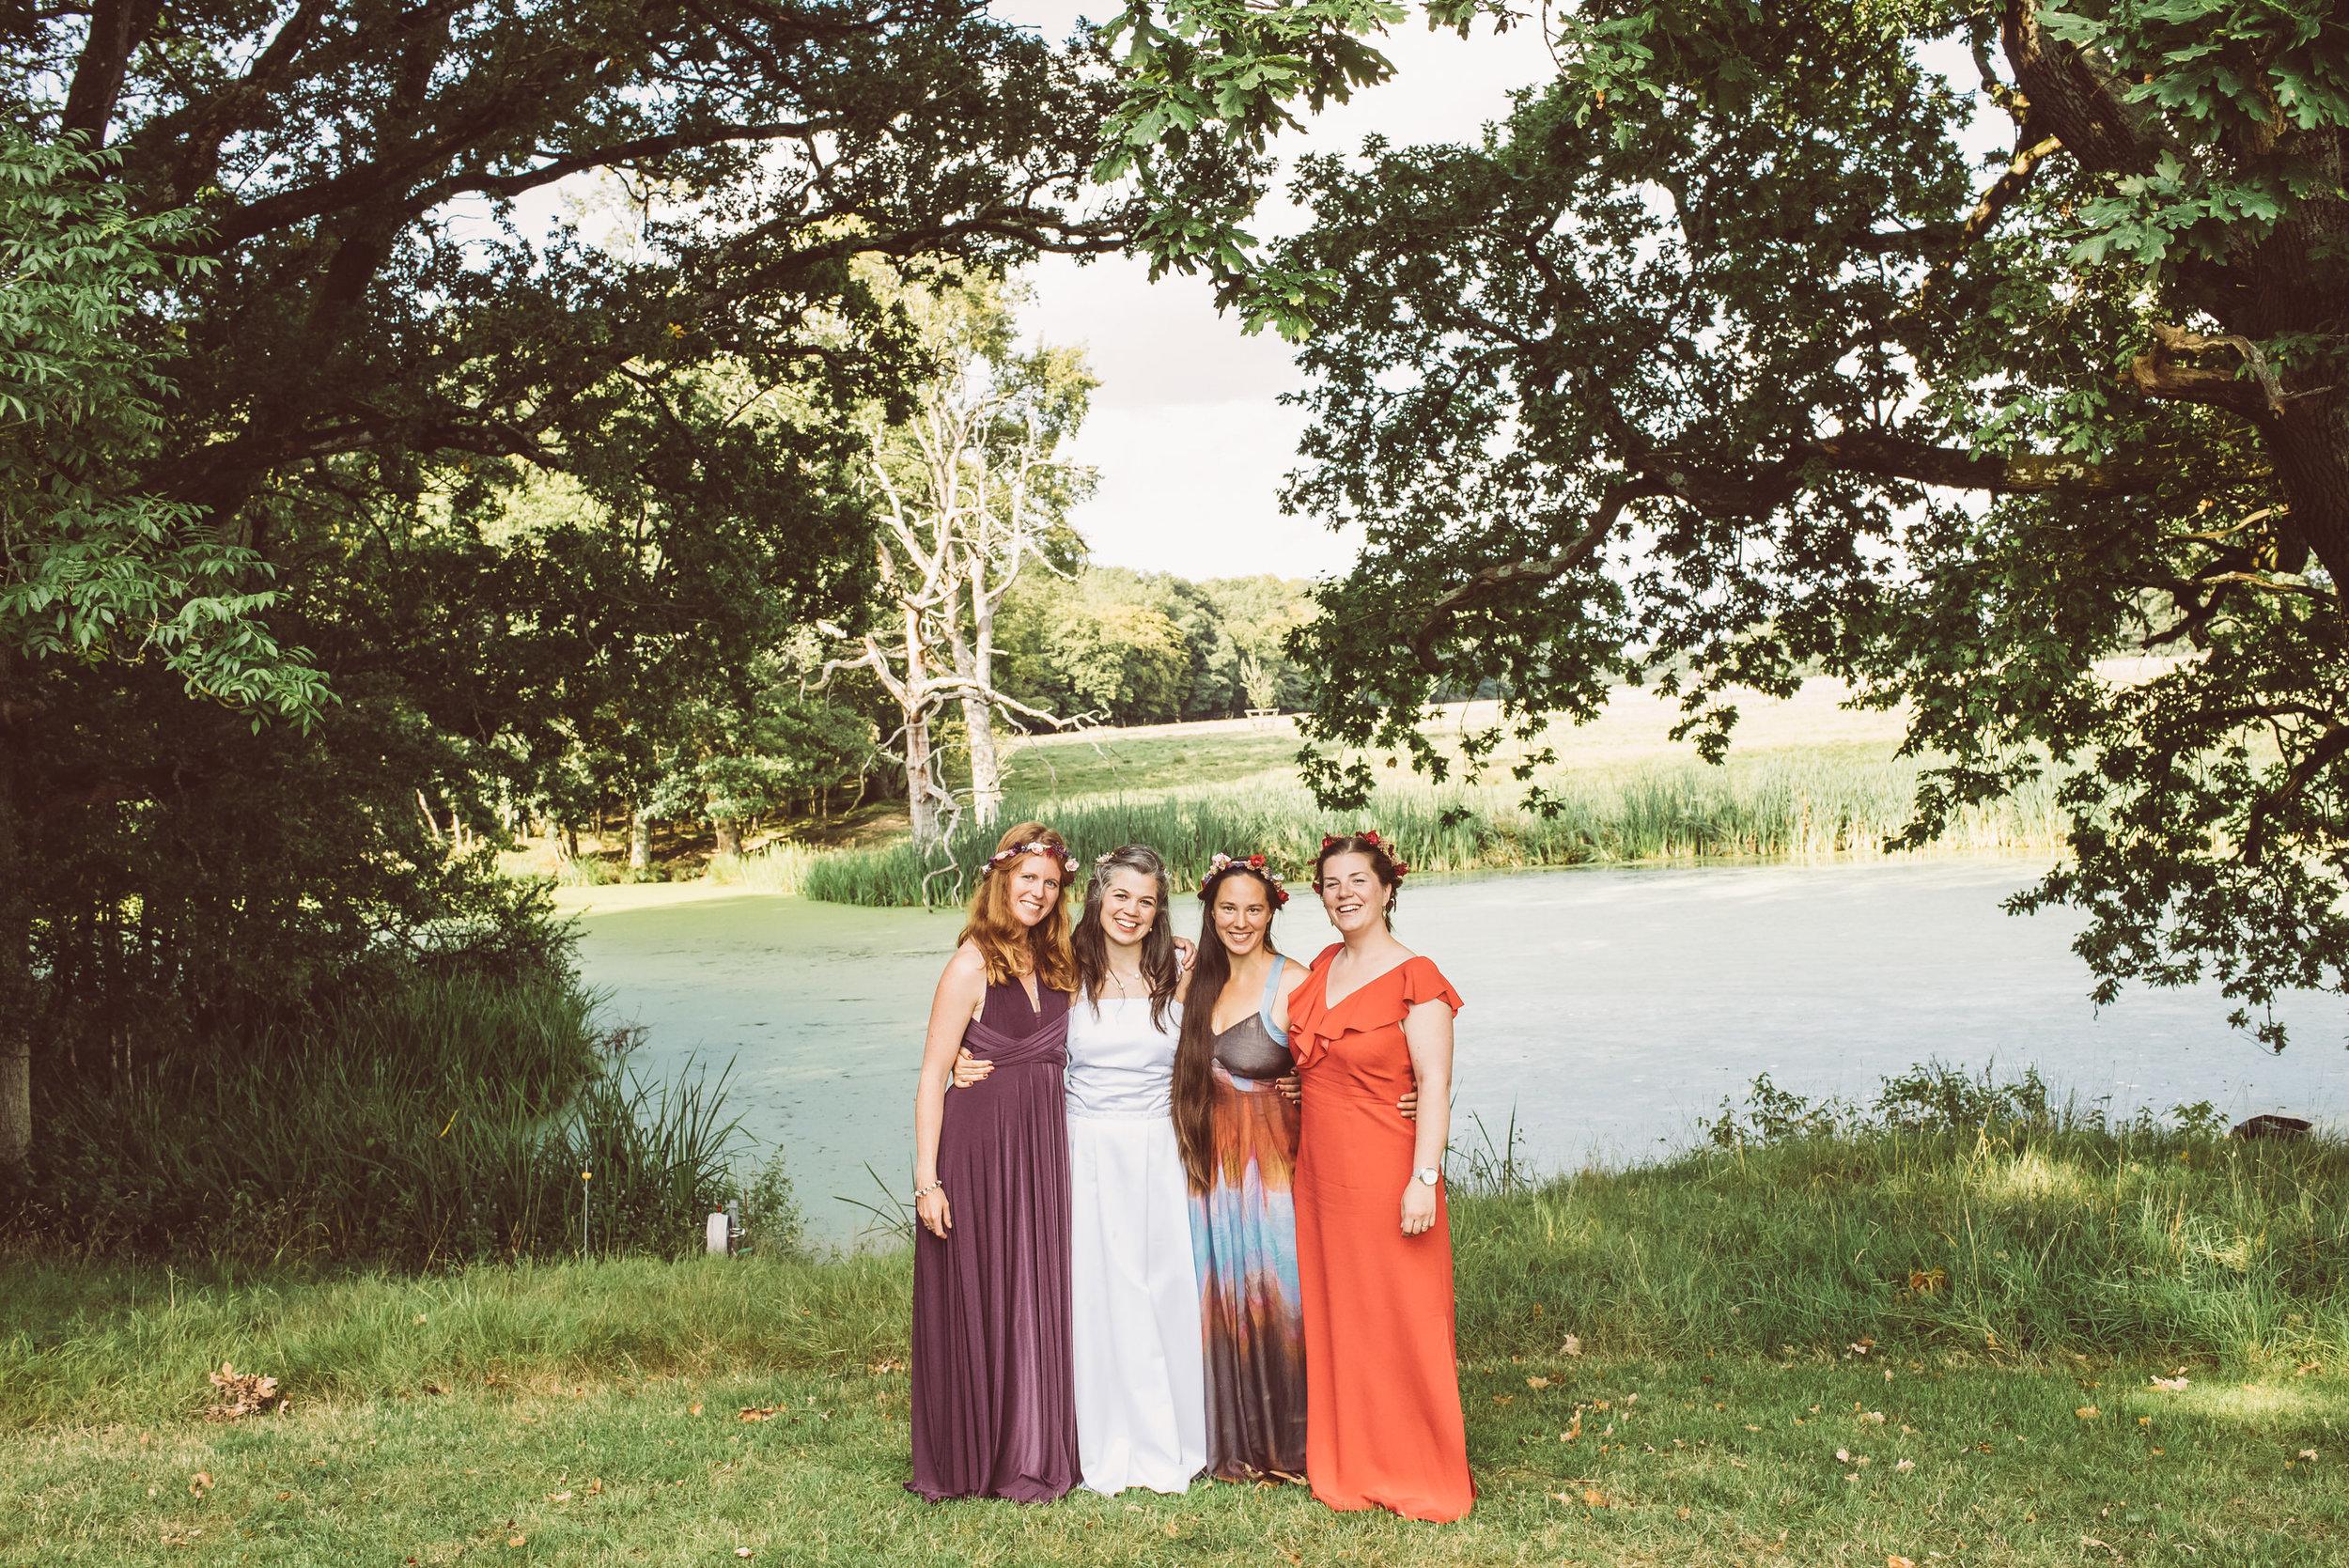 knepp-castle-boho-outdoor-wedding-358.jpg